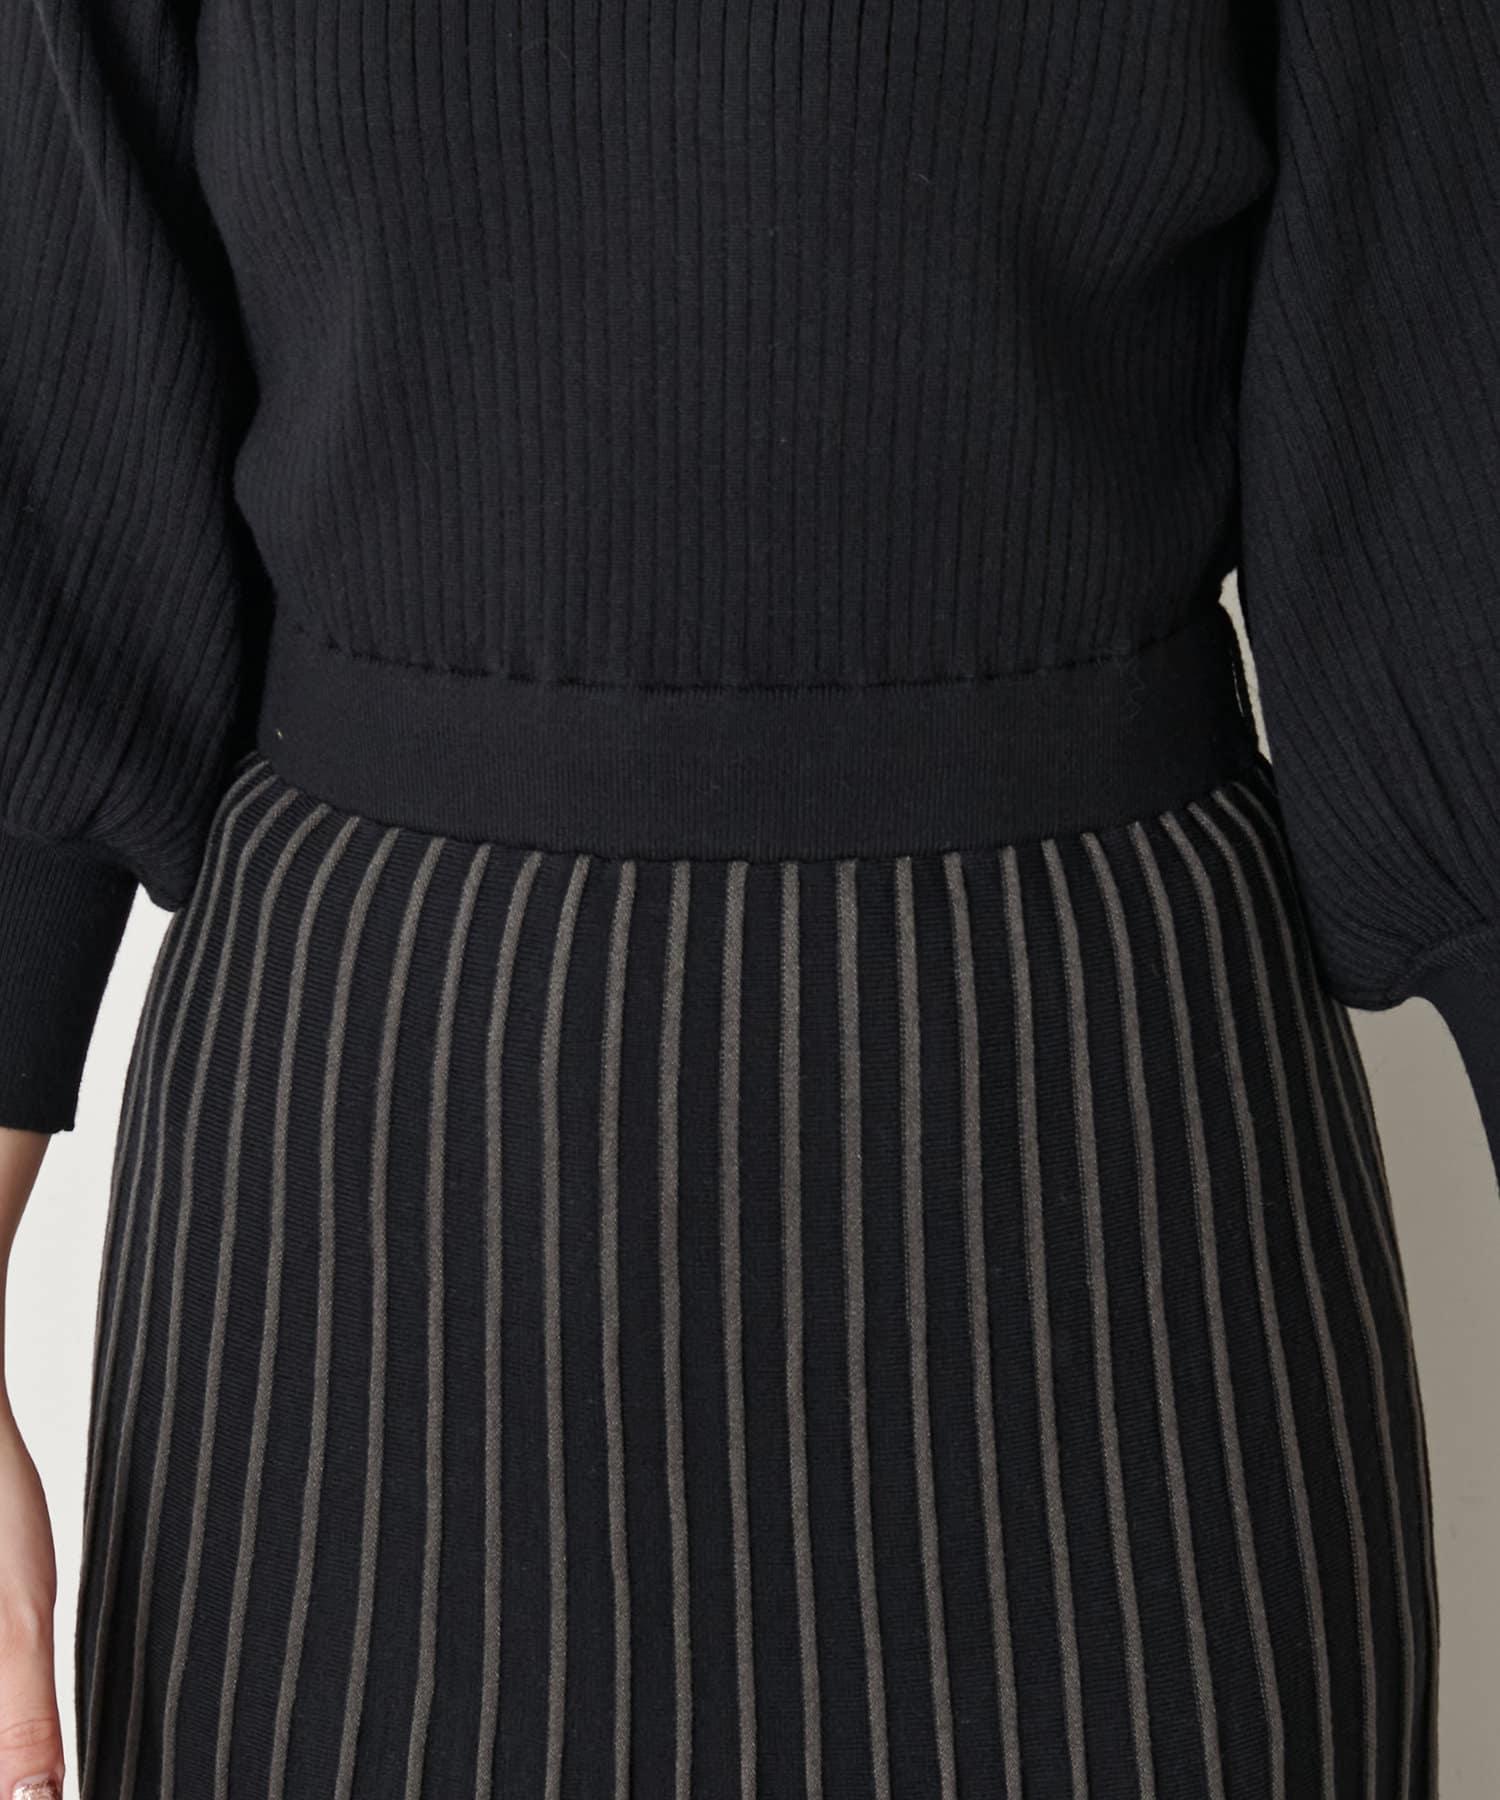 natural couture(ナチュラルクチュール) 【WEB限定・大好評リバイバルアイテム】配色ニットプリーツワンピース